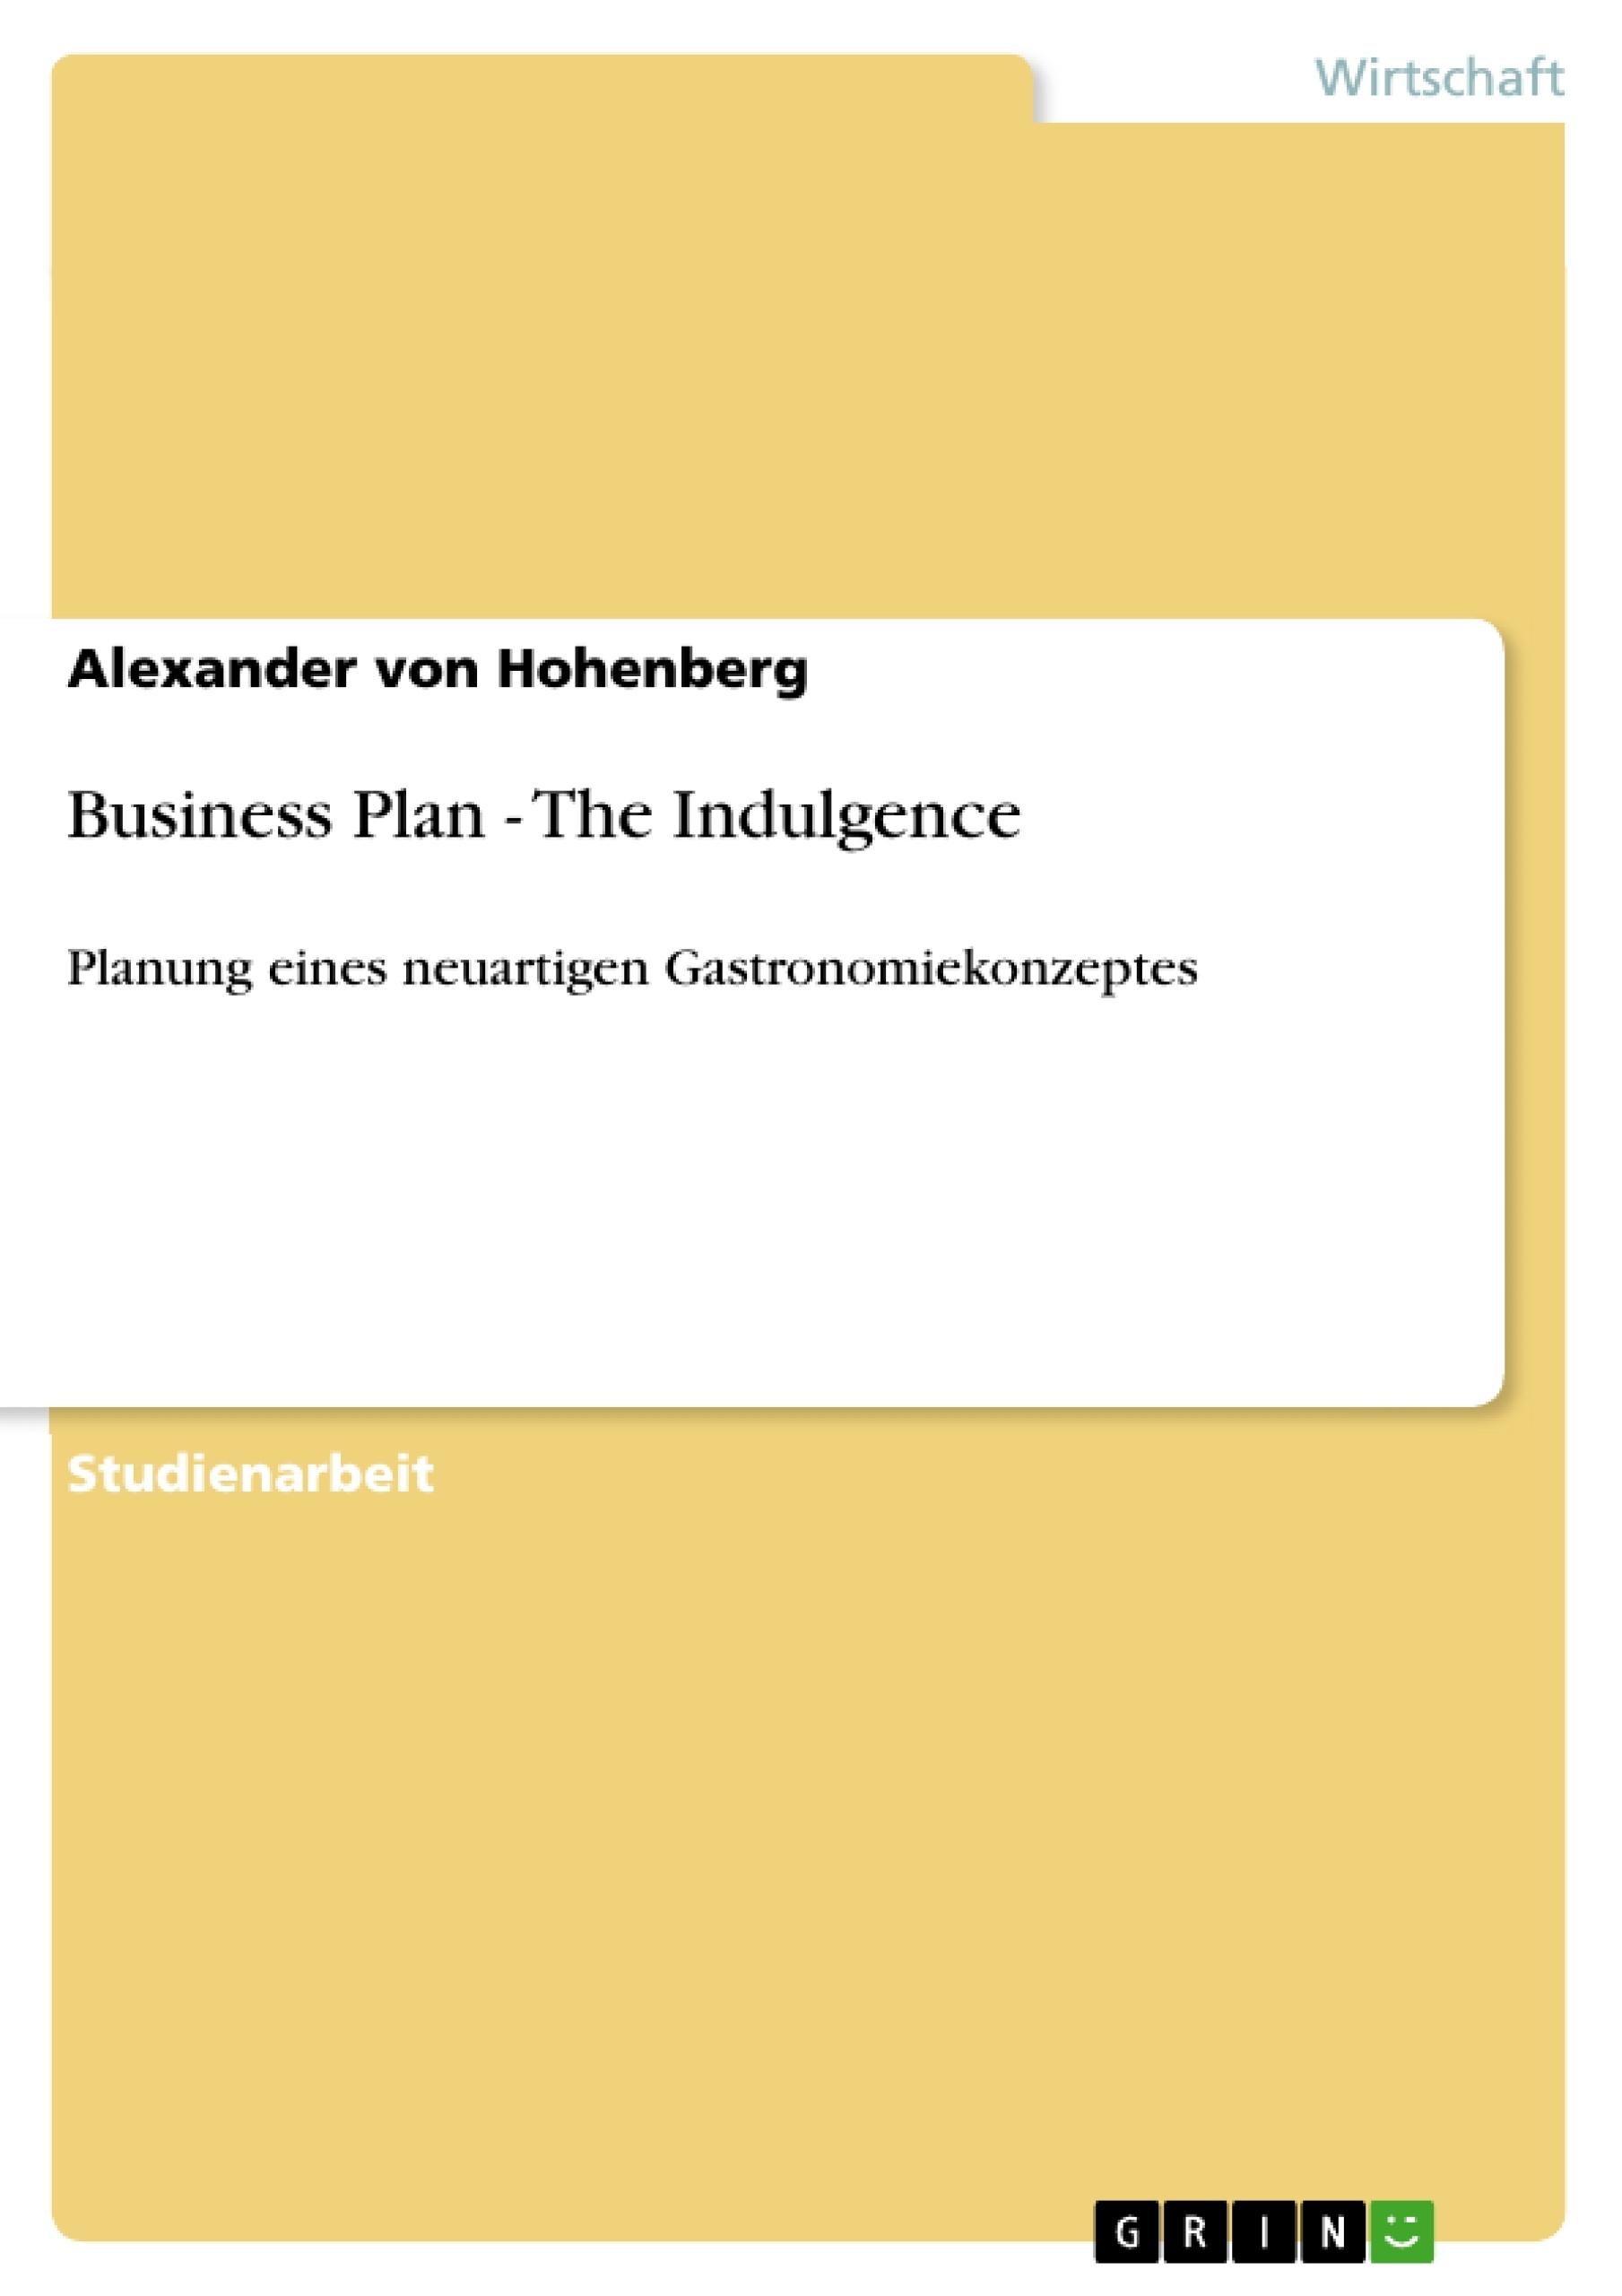 Titel: Business Plan - The Indulgence